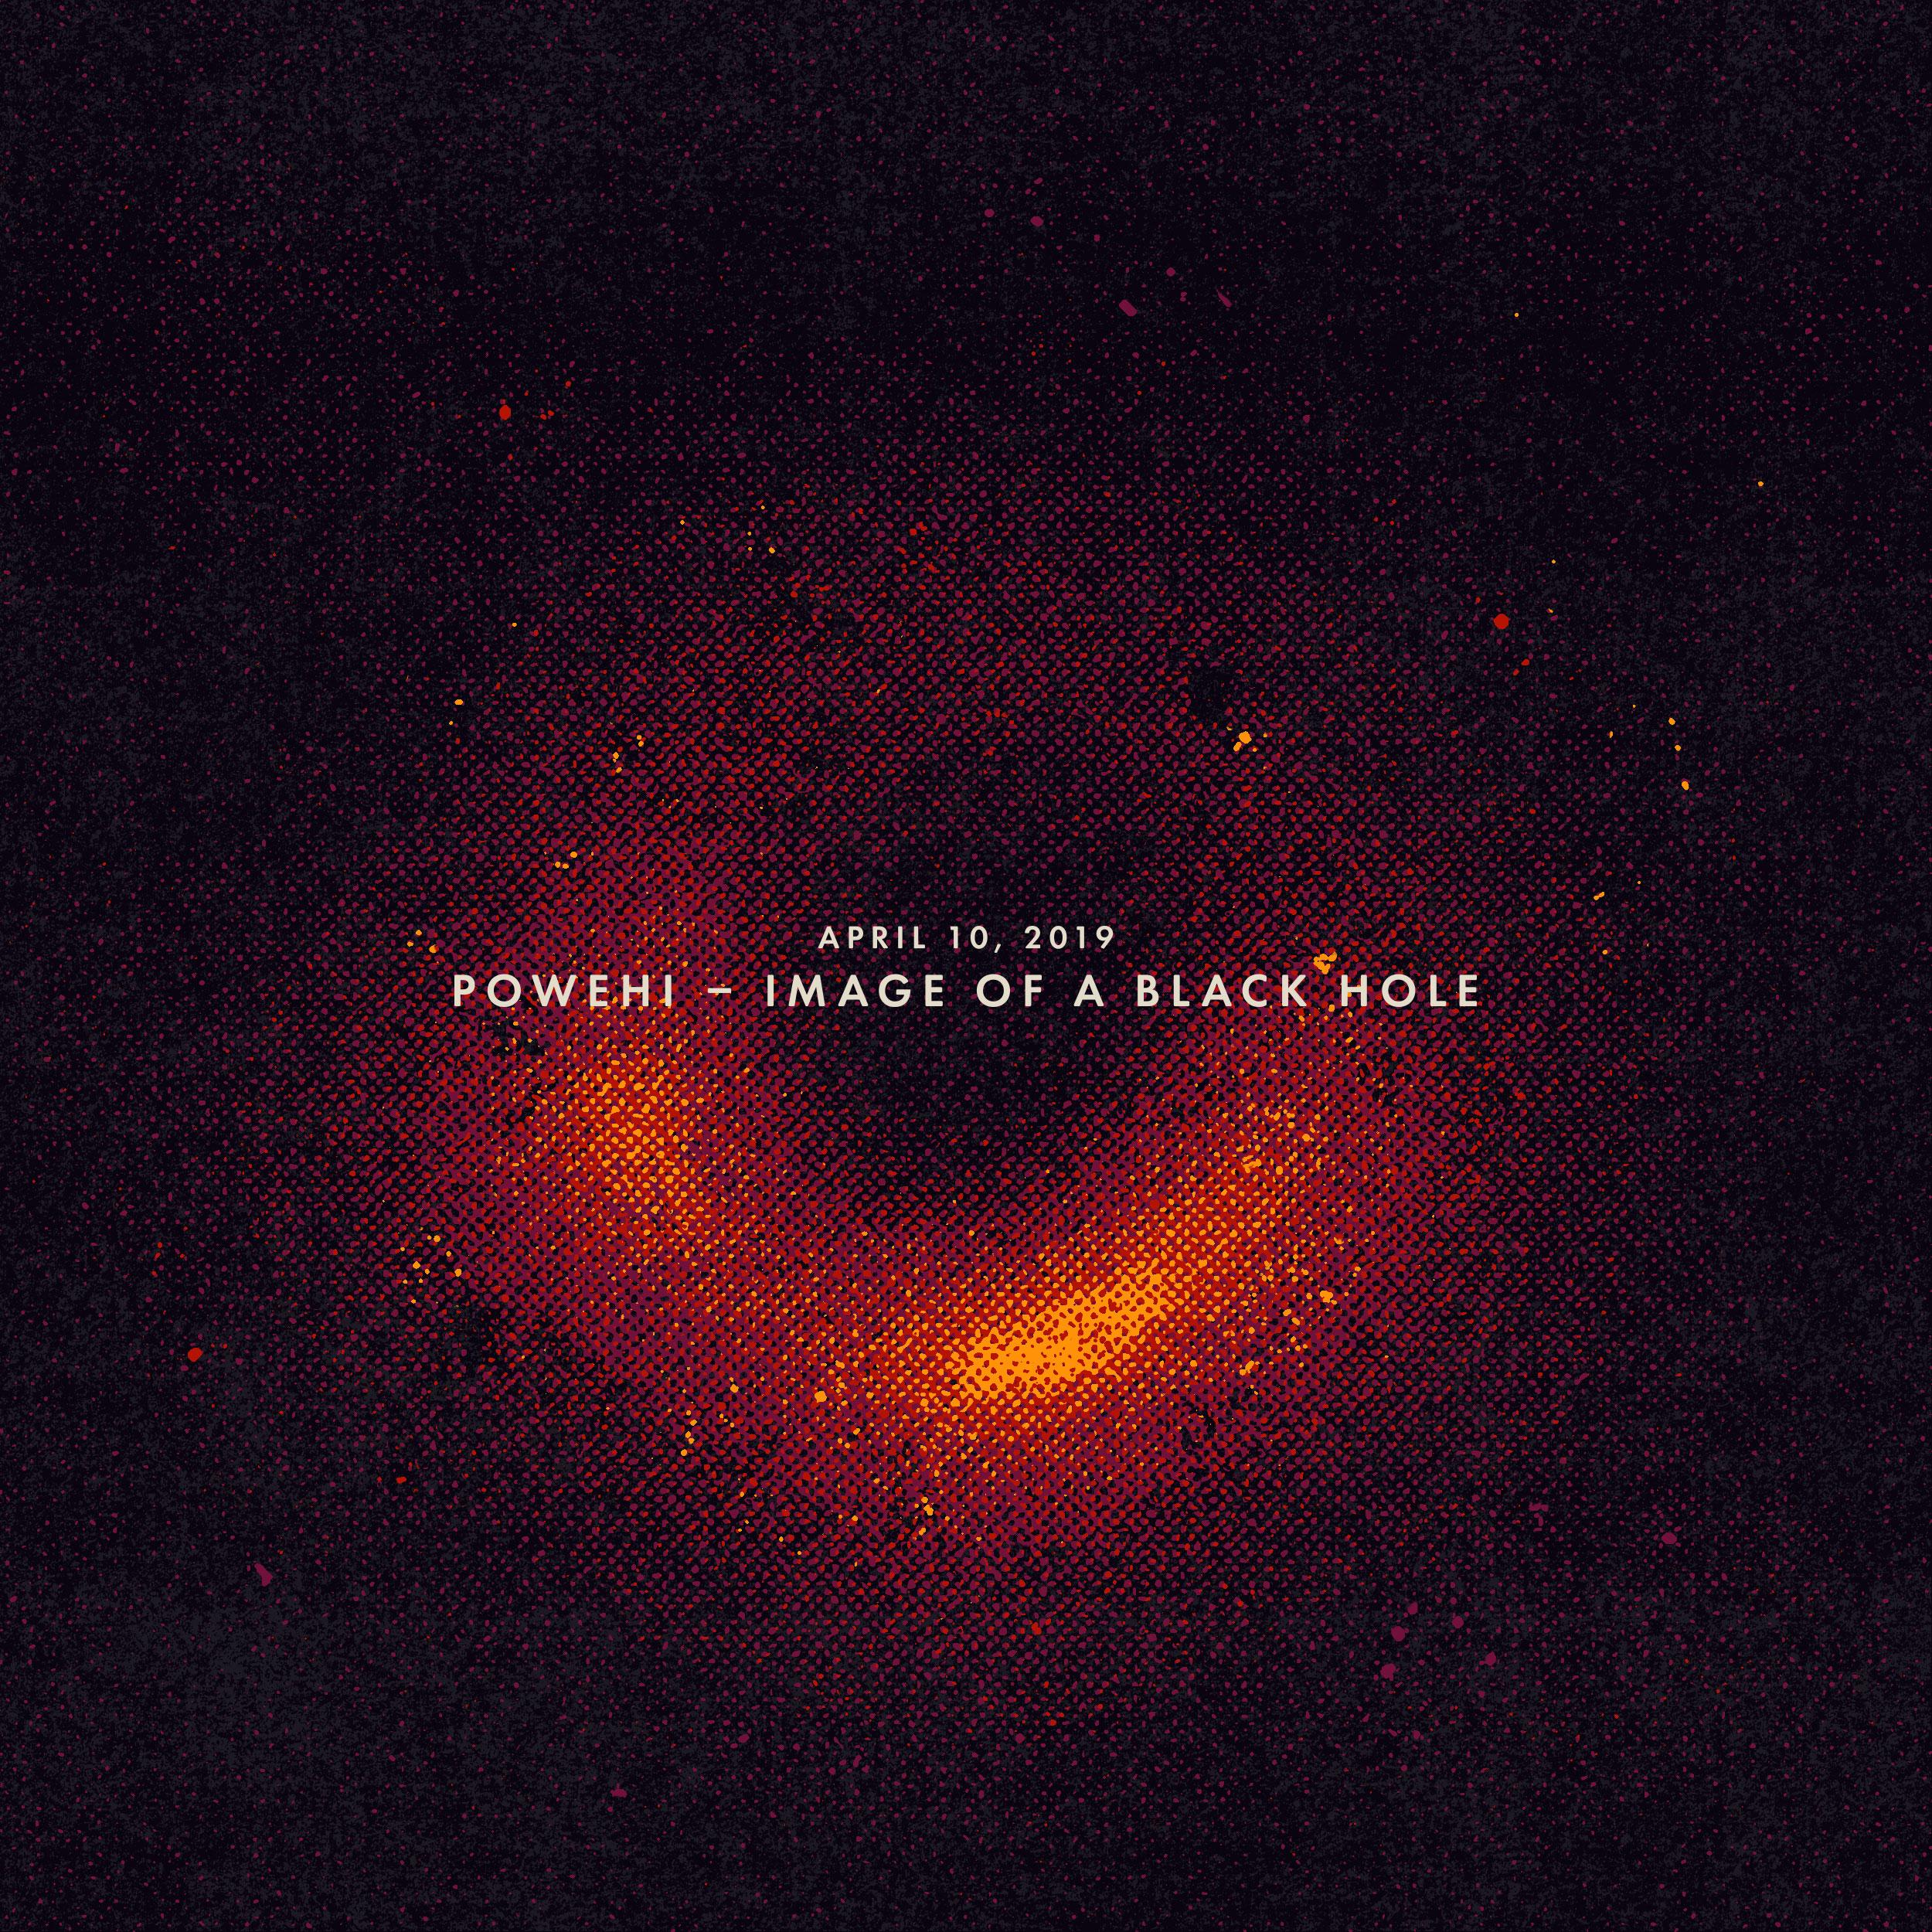 Astronomy-BlackHole_01.jpg